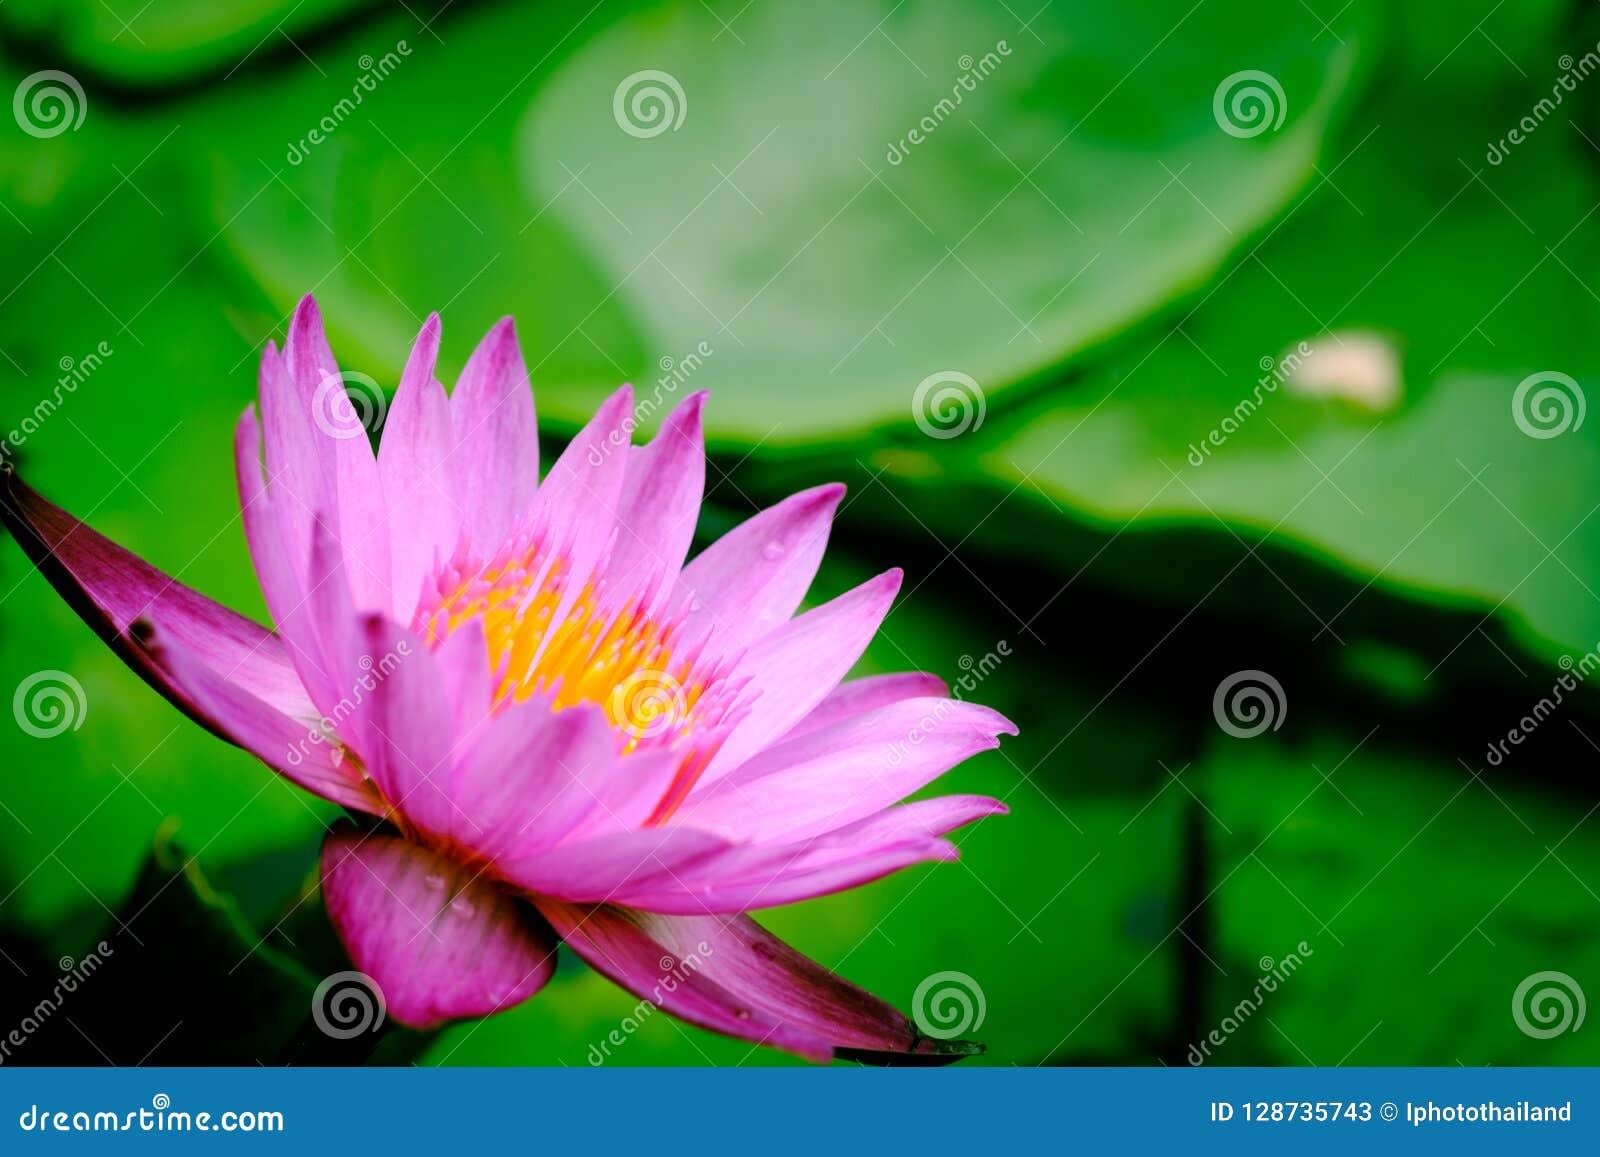 A Blooming Pink Lotus Flower Natural Background Lotus Leaf Lily